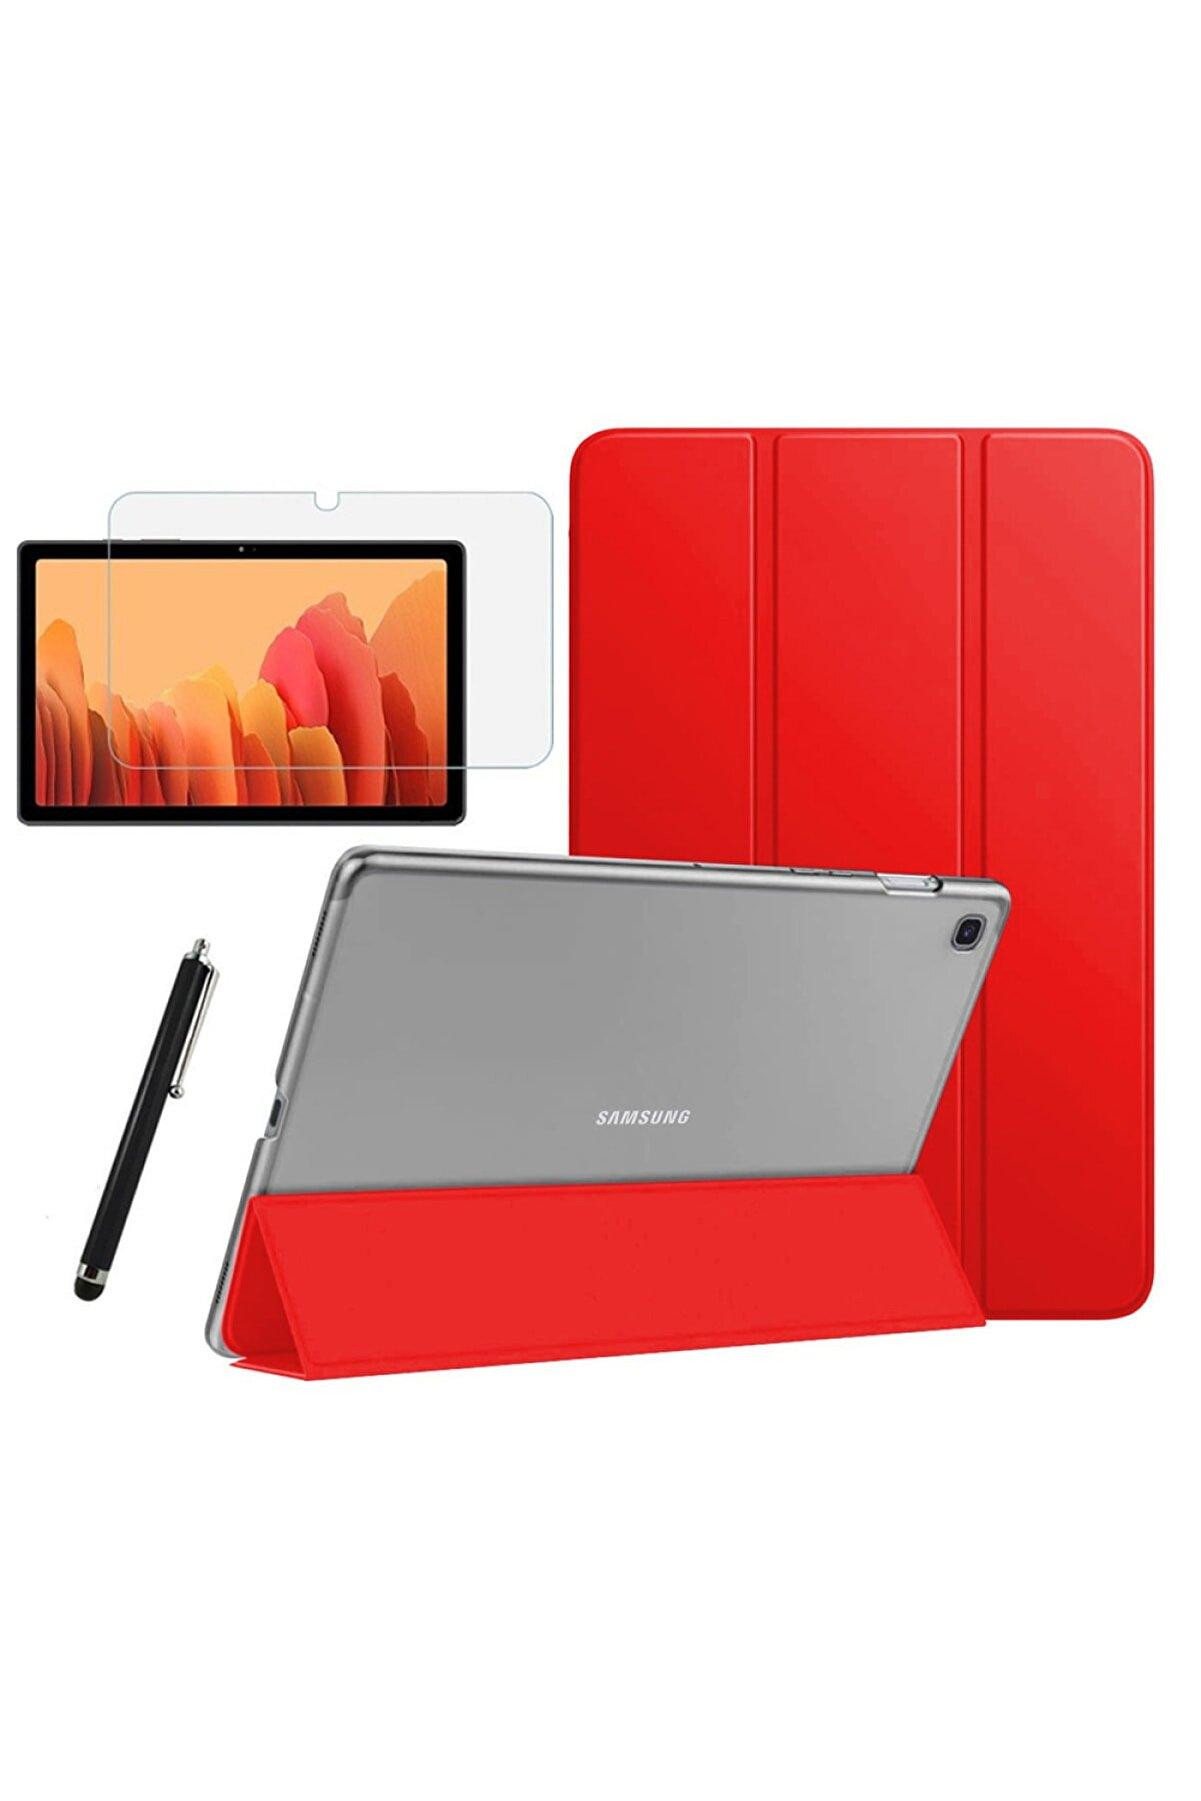 BizimGross Galaxy Tab A7 Sm T500 T505 T507  Uyumlu Smart Kapak Tablet Kılıfı + Ekran Koruyucu + Kalem 10.4 Inç